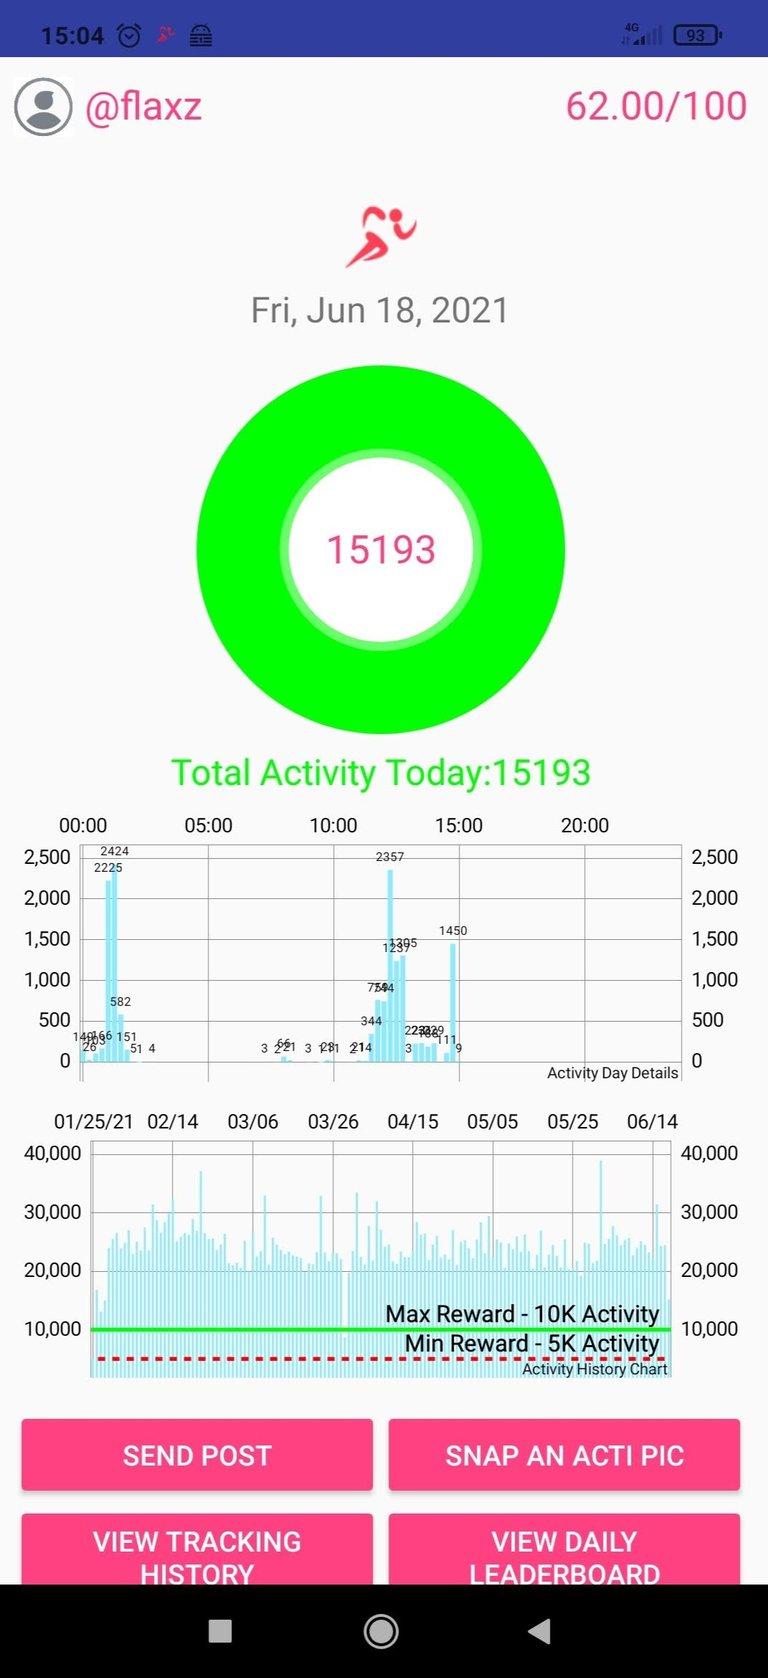 Screenshot_2021-06-18-15-04-28-461_io.actifit.fitnesstracker.actifitfitnesstracker.jpg